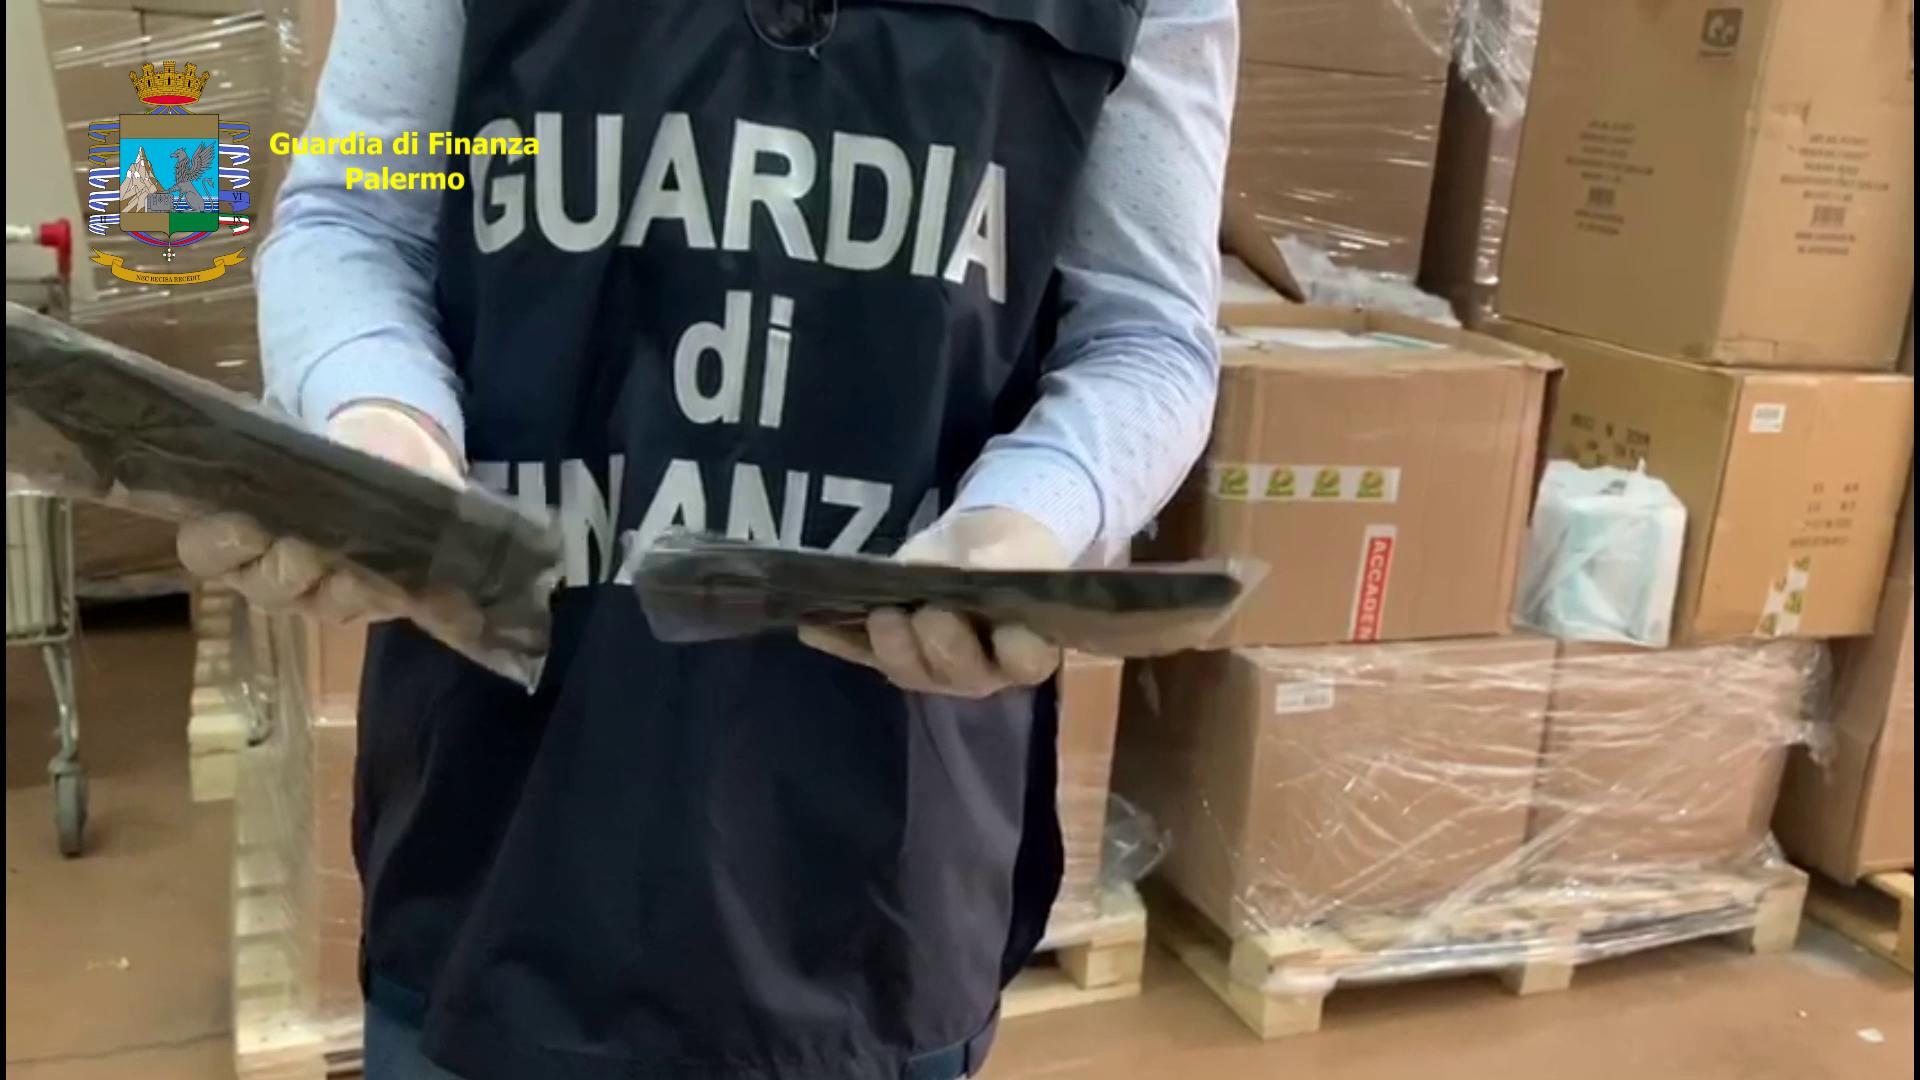 Termini Imerese: Guardia di Finanza sequestra quarantamila mascherine